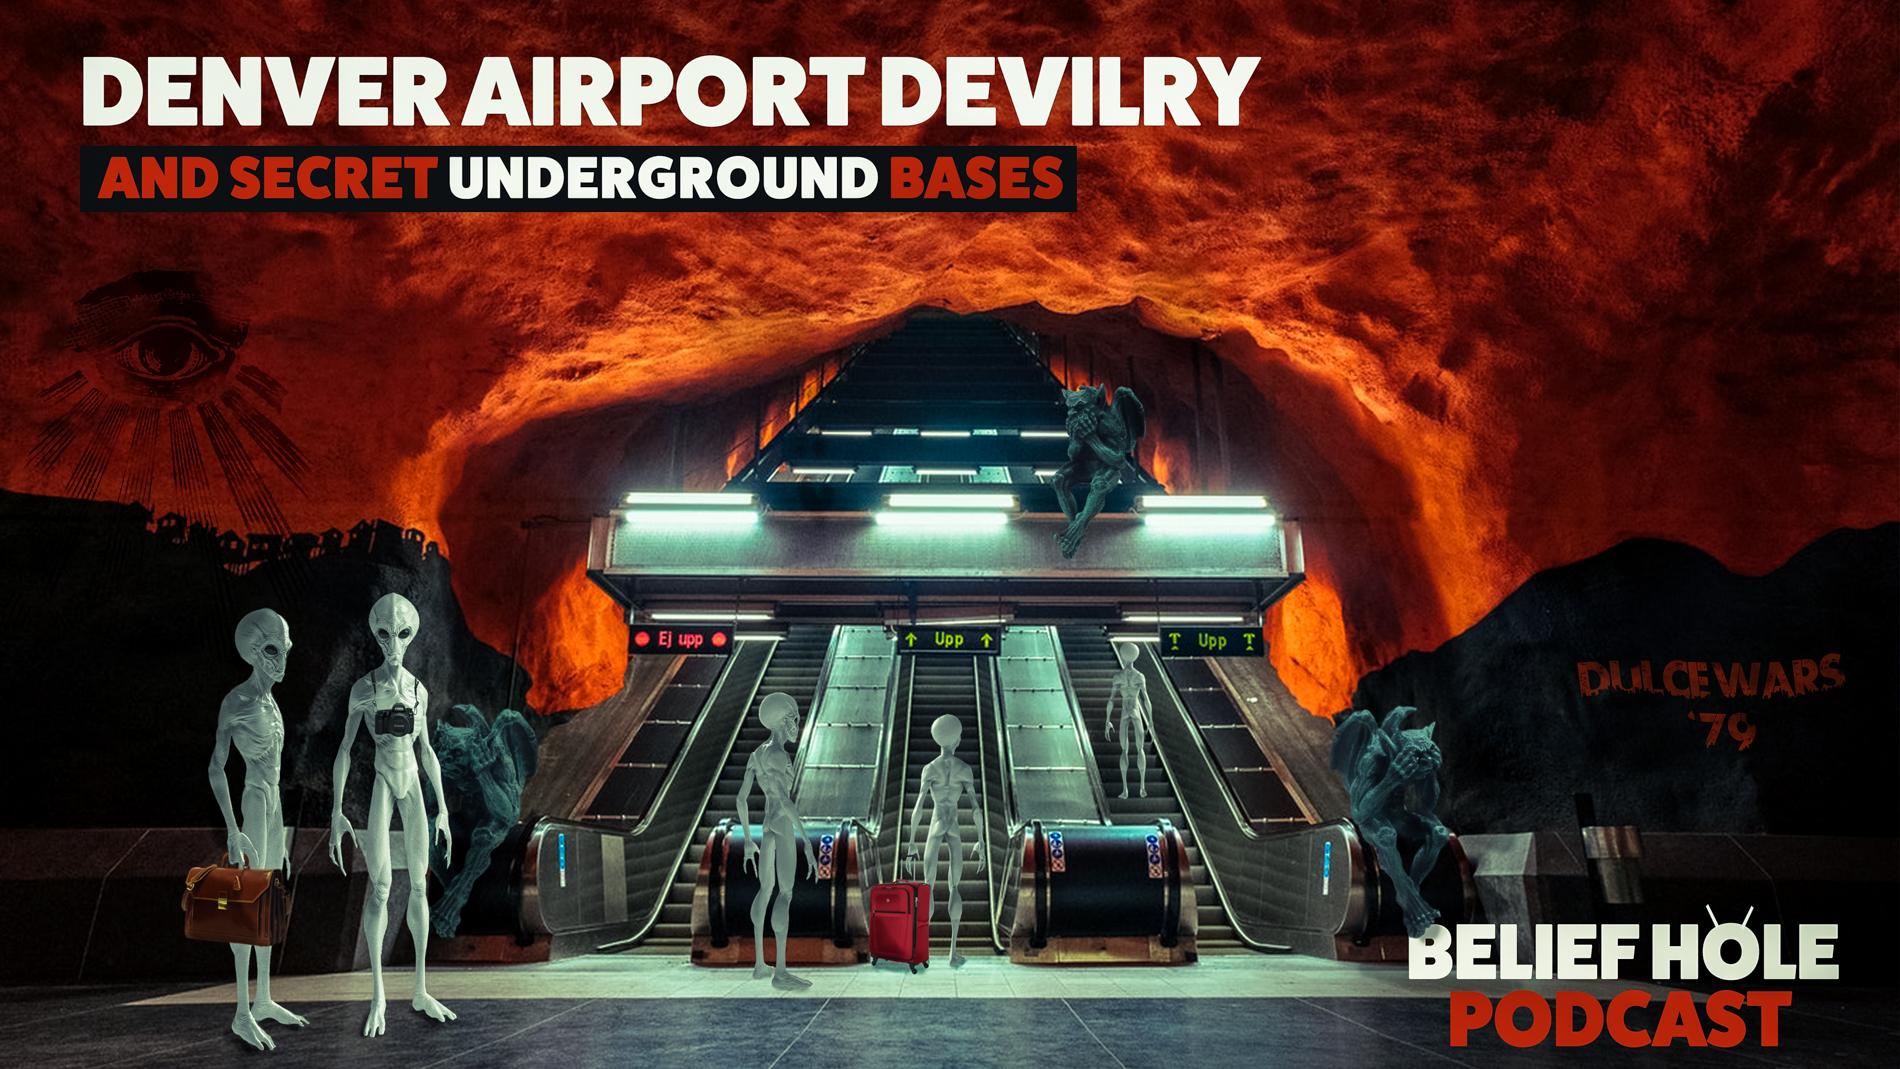 Denver Airport Devilry and Secret Underground Bases